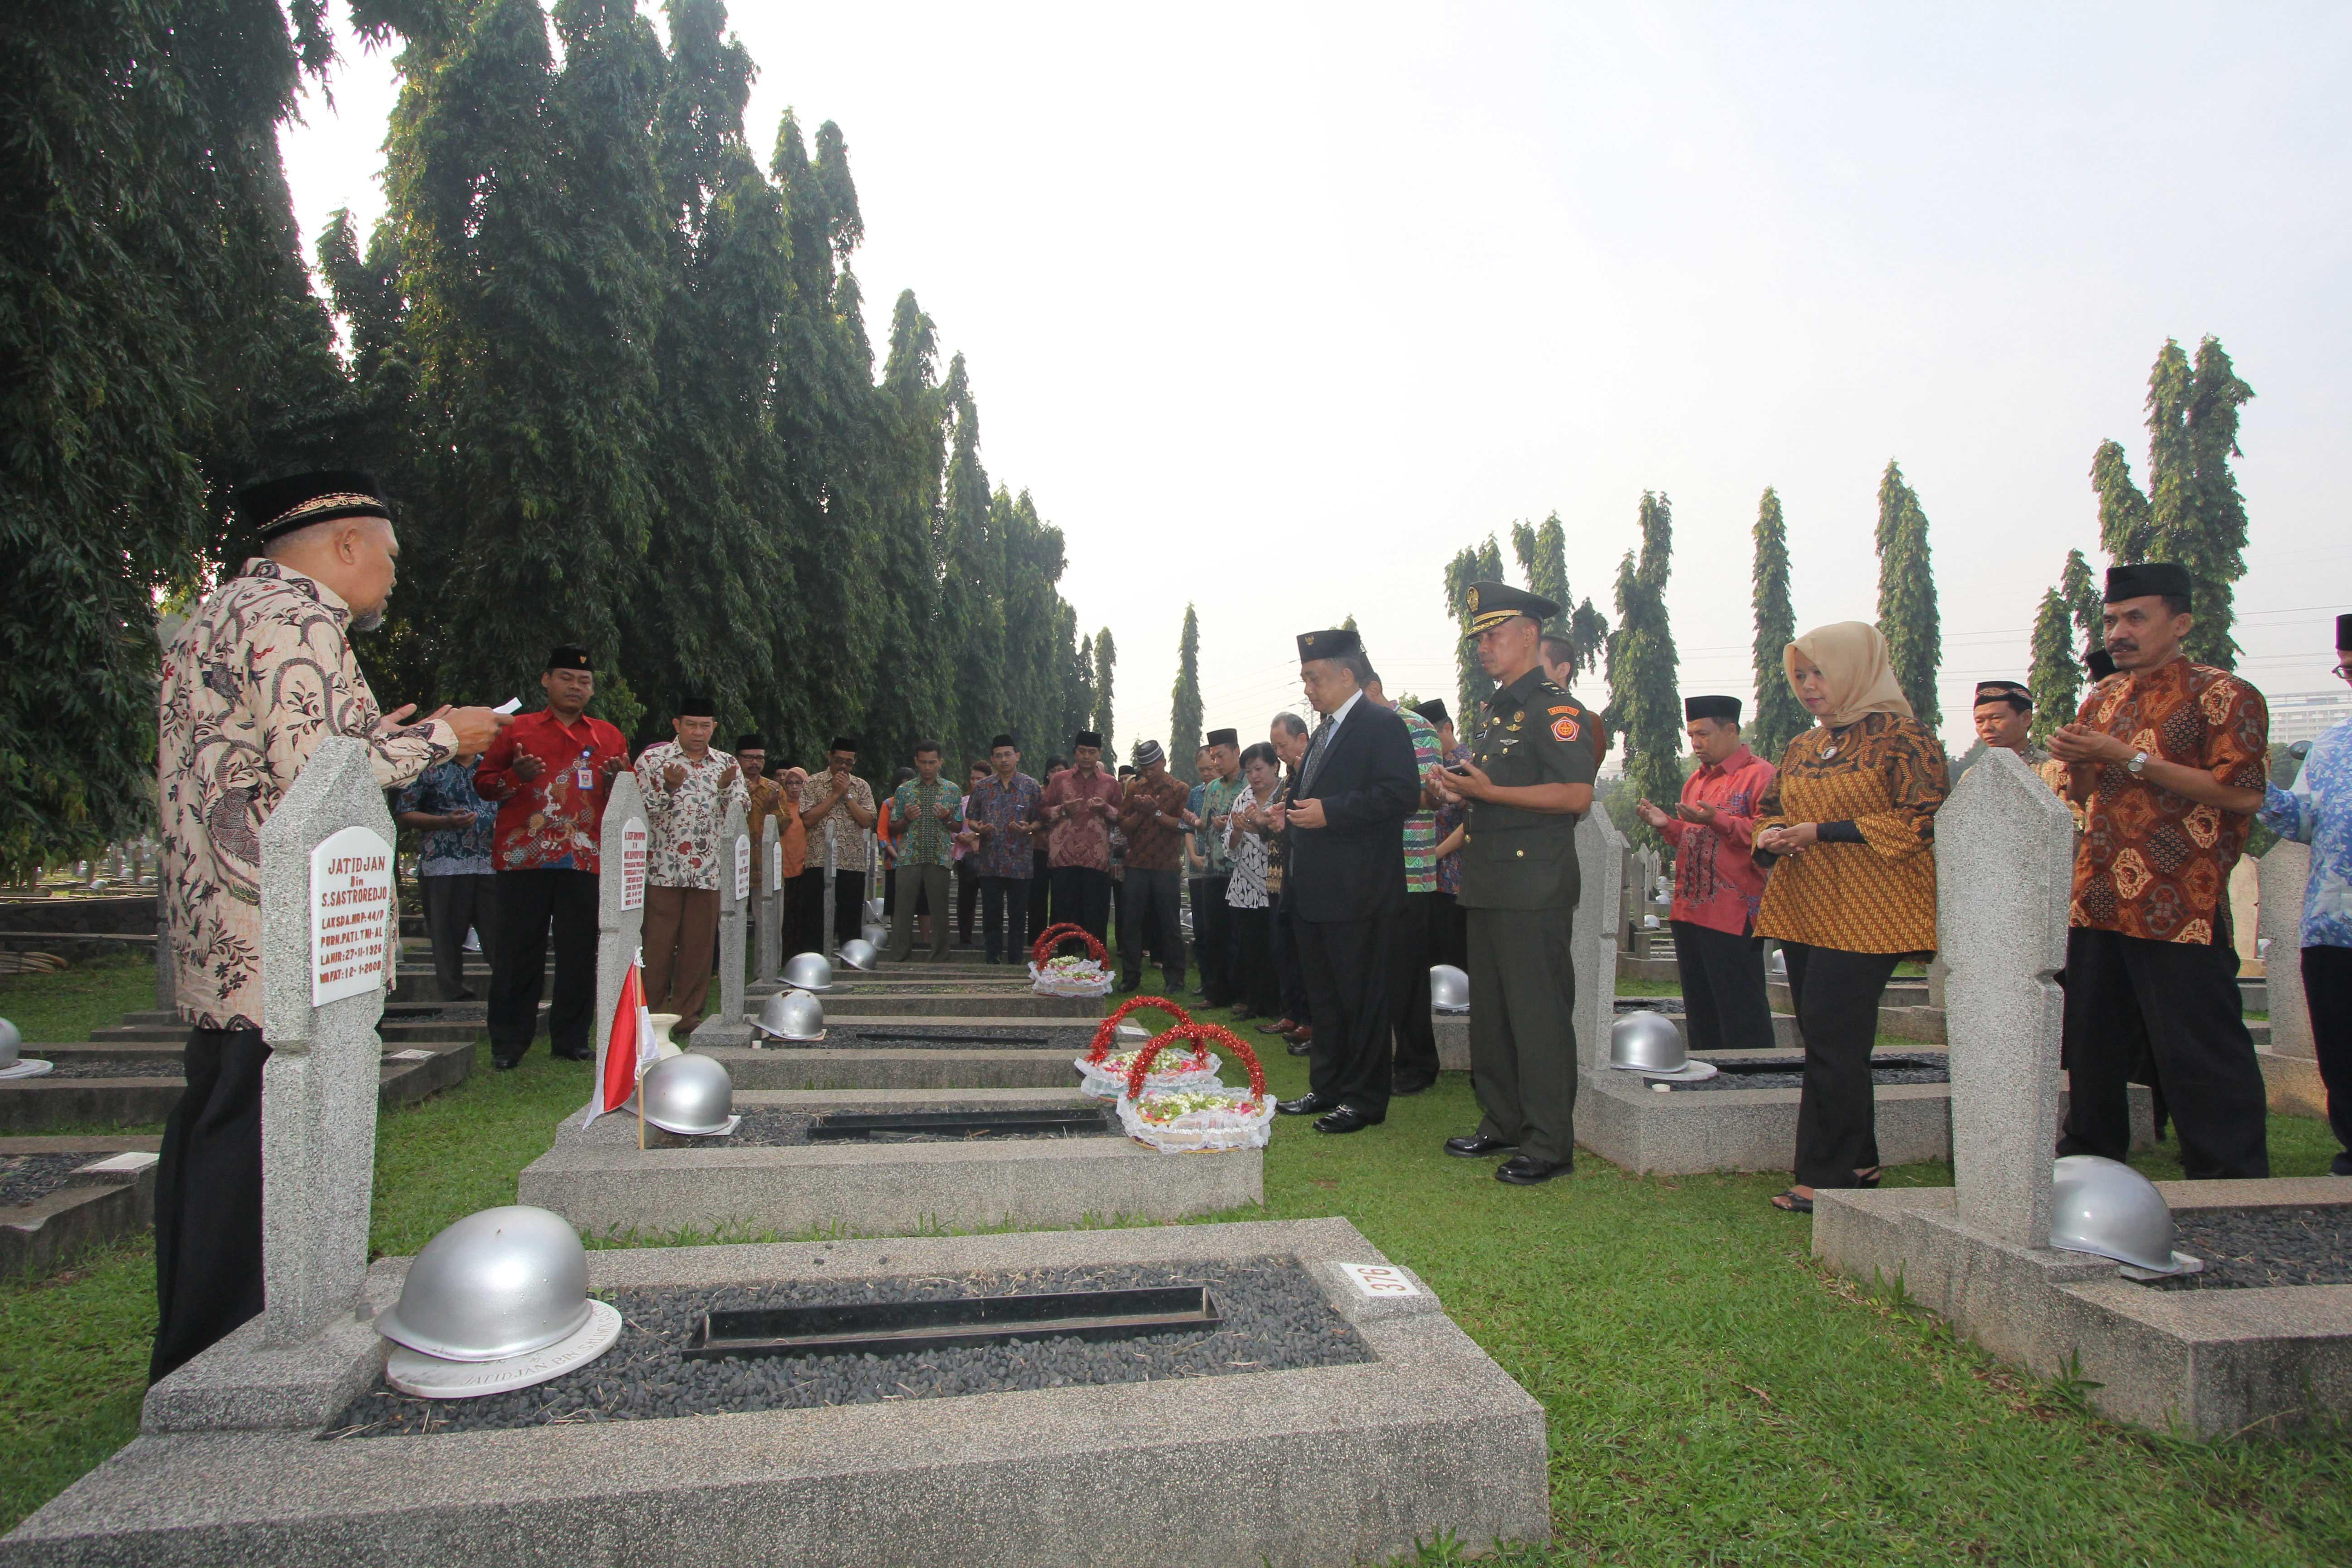 LIA ziarah ke taman makam pahlawan Kalibata